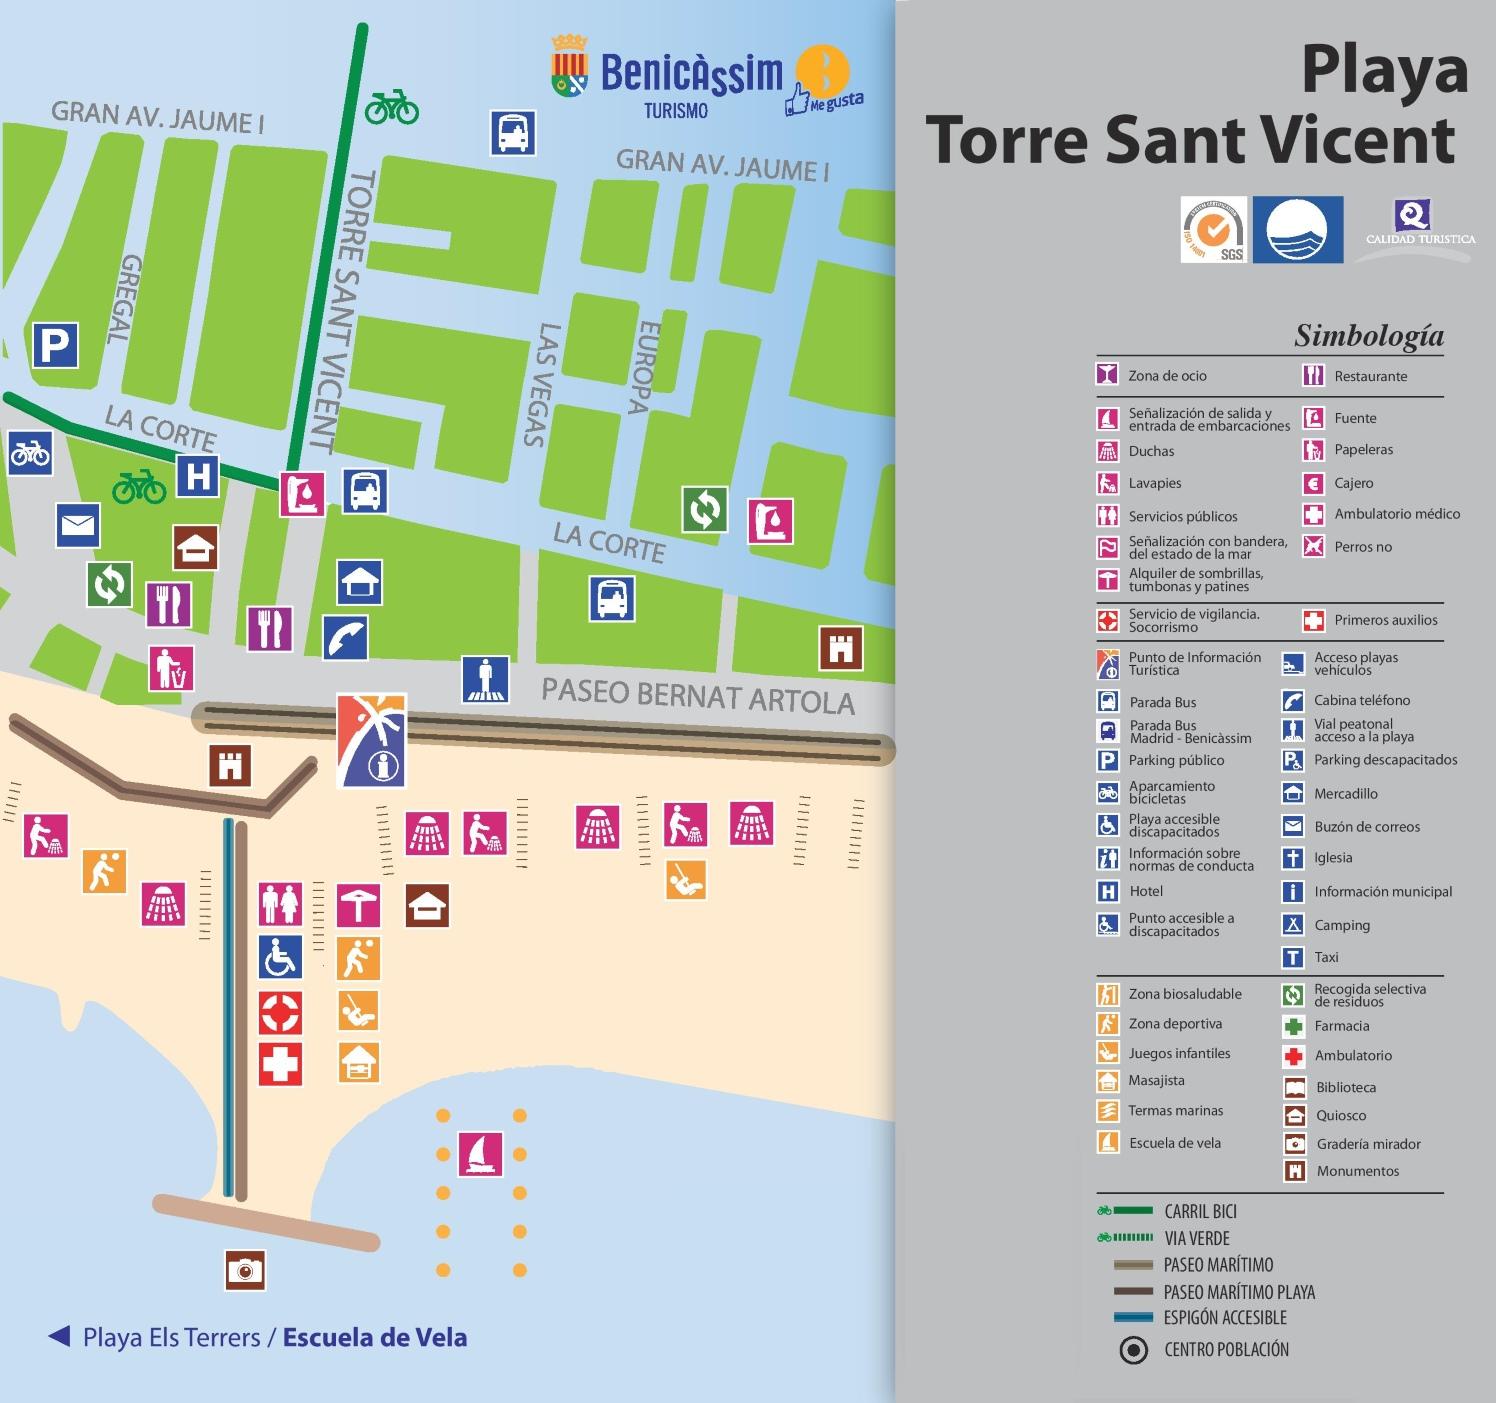 Playa Torre Sant Vicent map